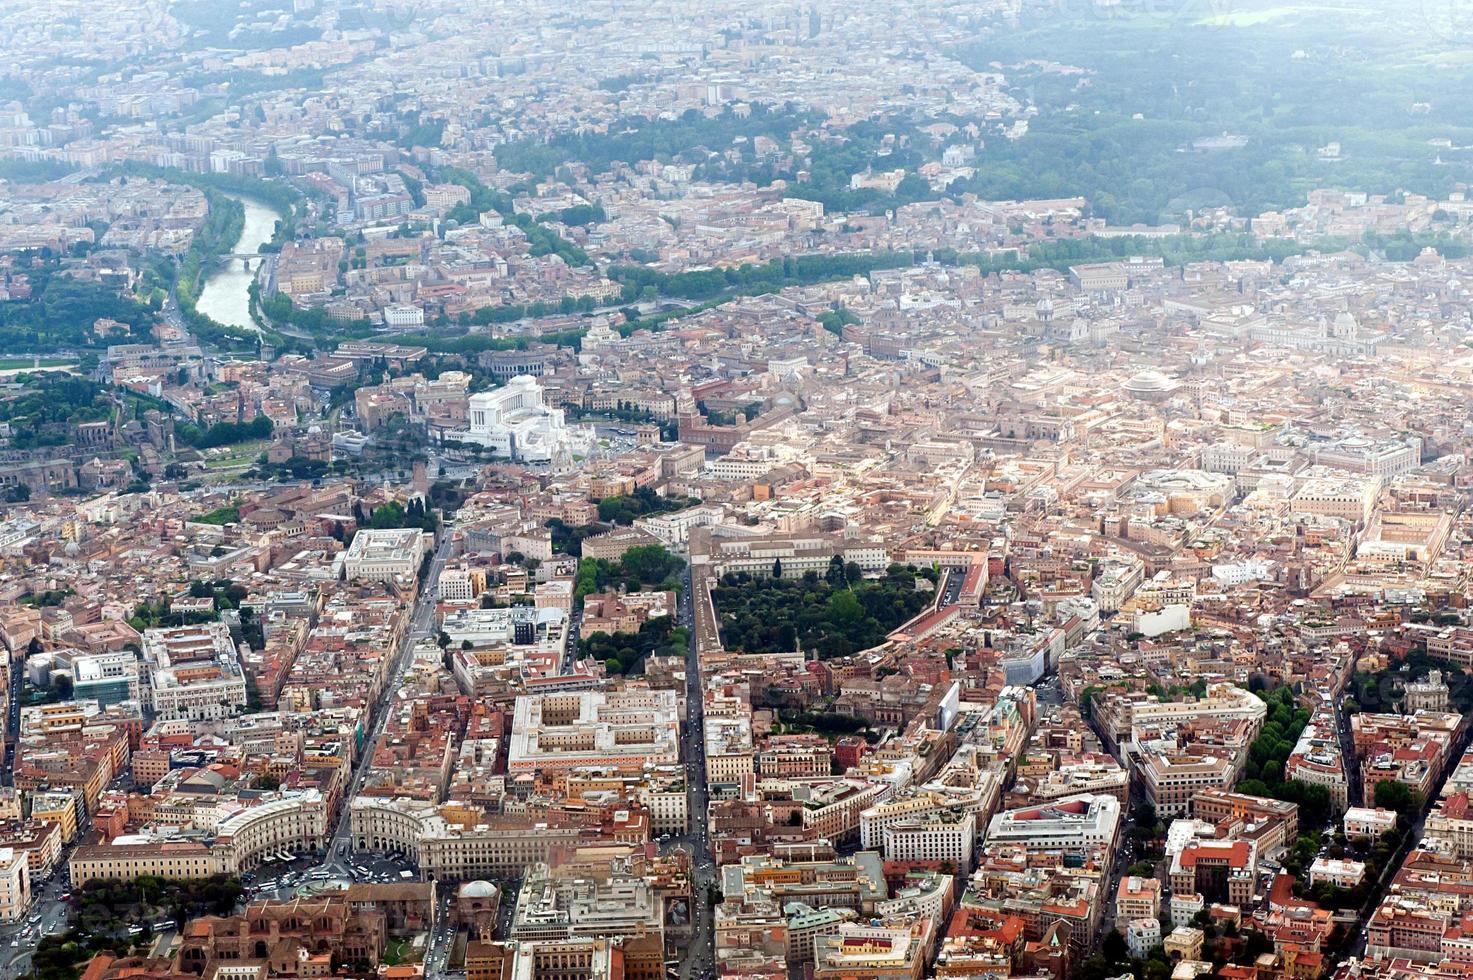 fotografia aérea de roma e vaticano foto